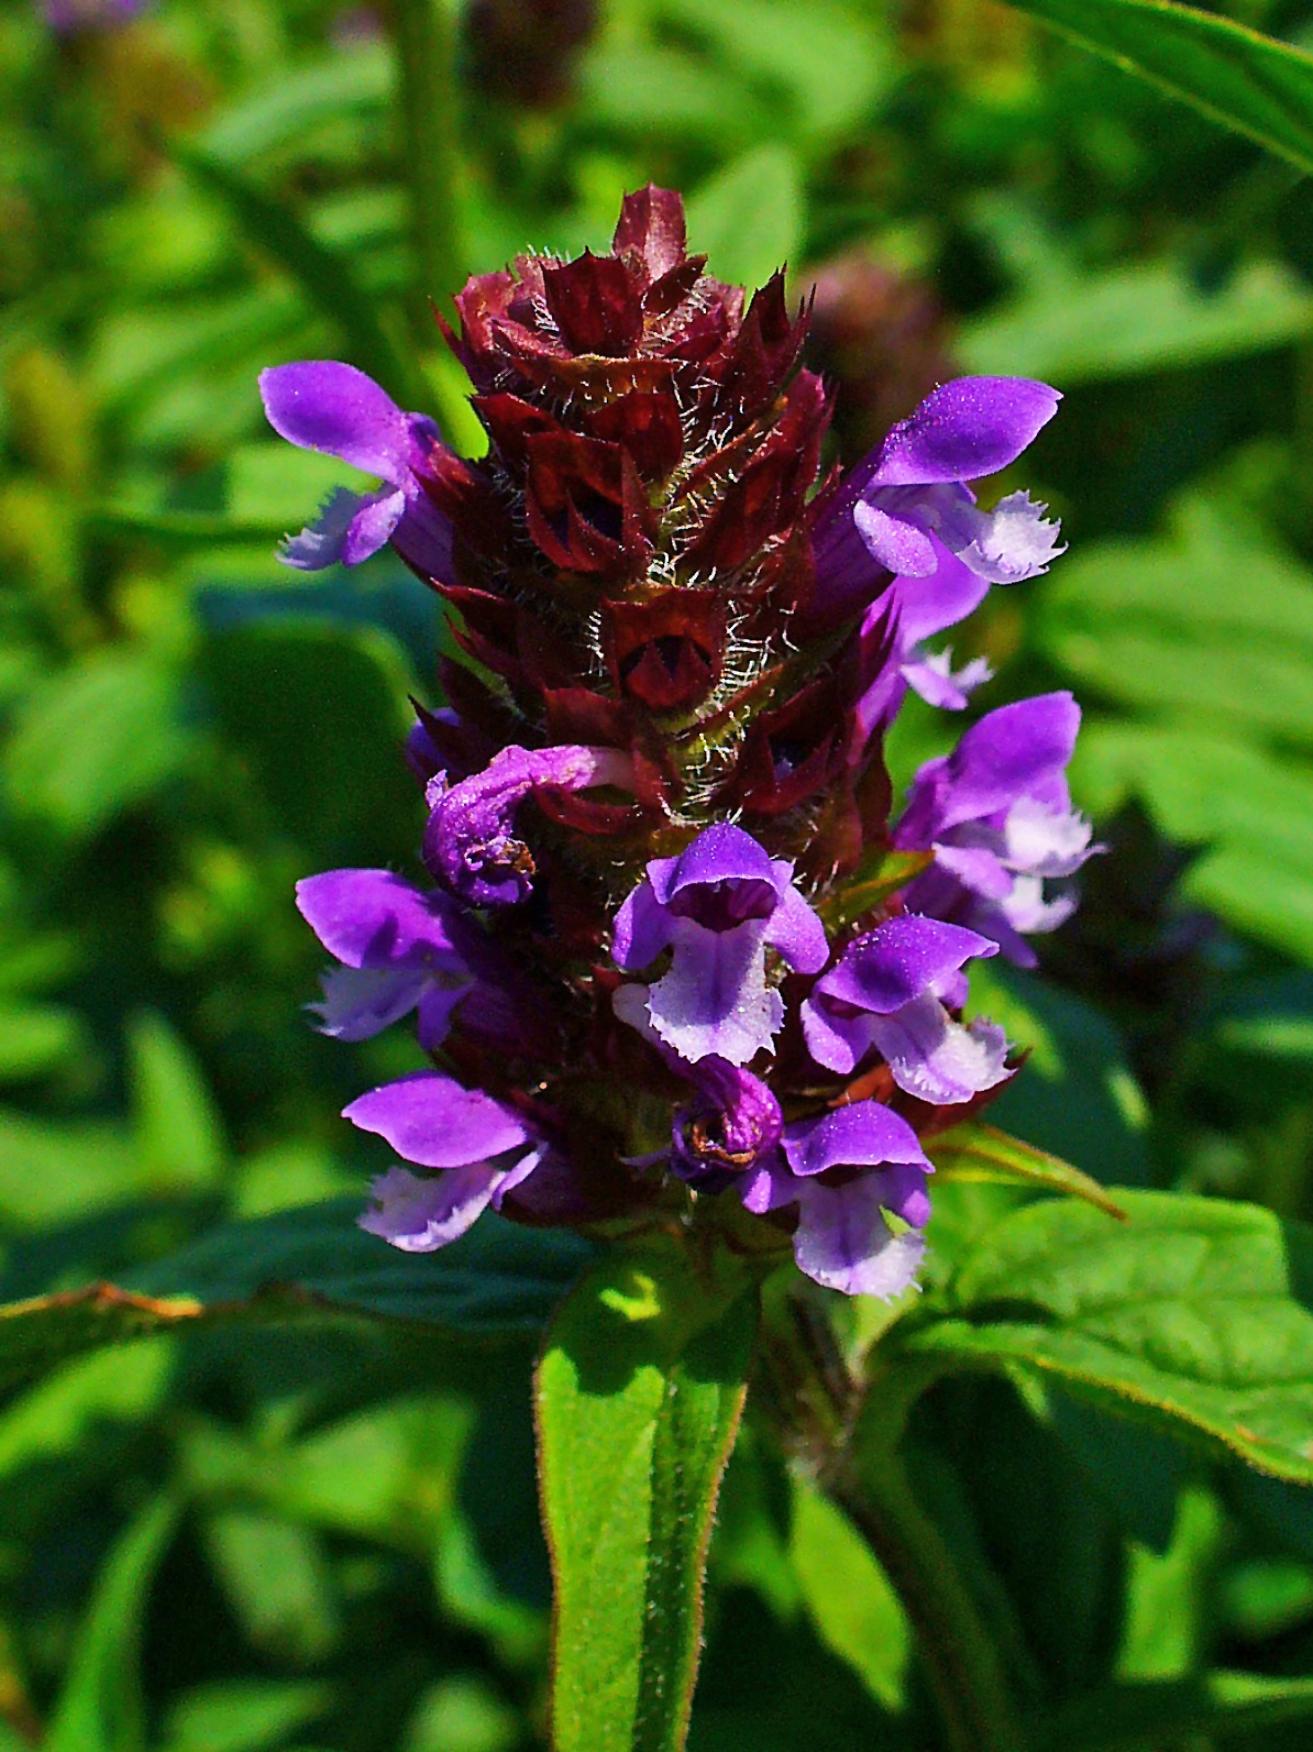 H. Zell, GNU (Wikipedia Commons) – Kleine Braunelle, Blütenstand